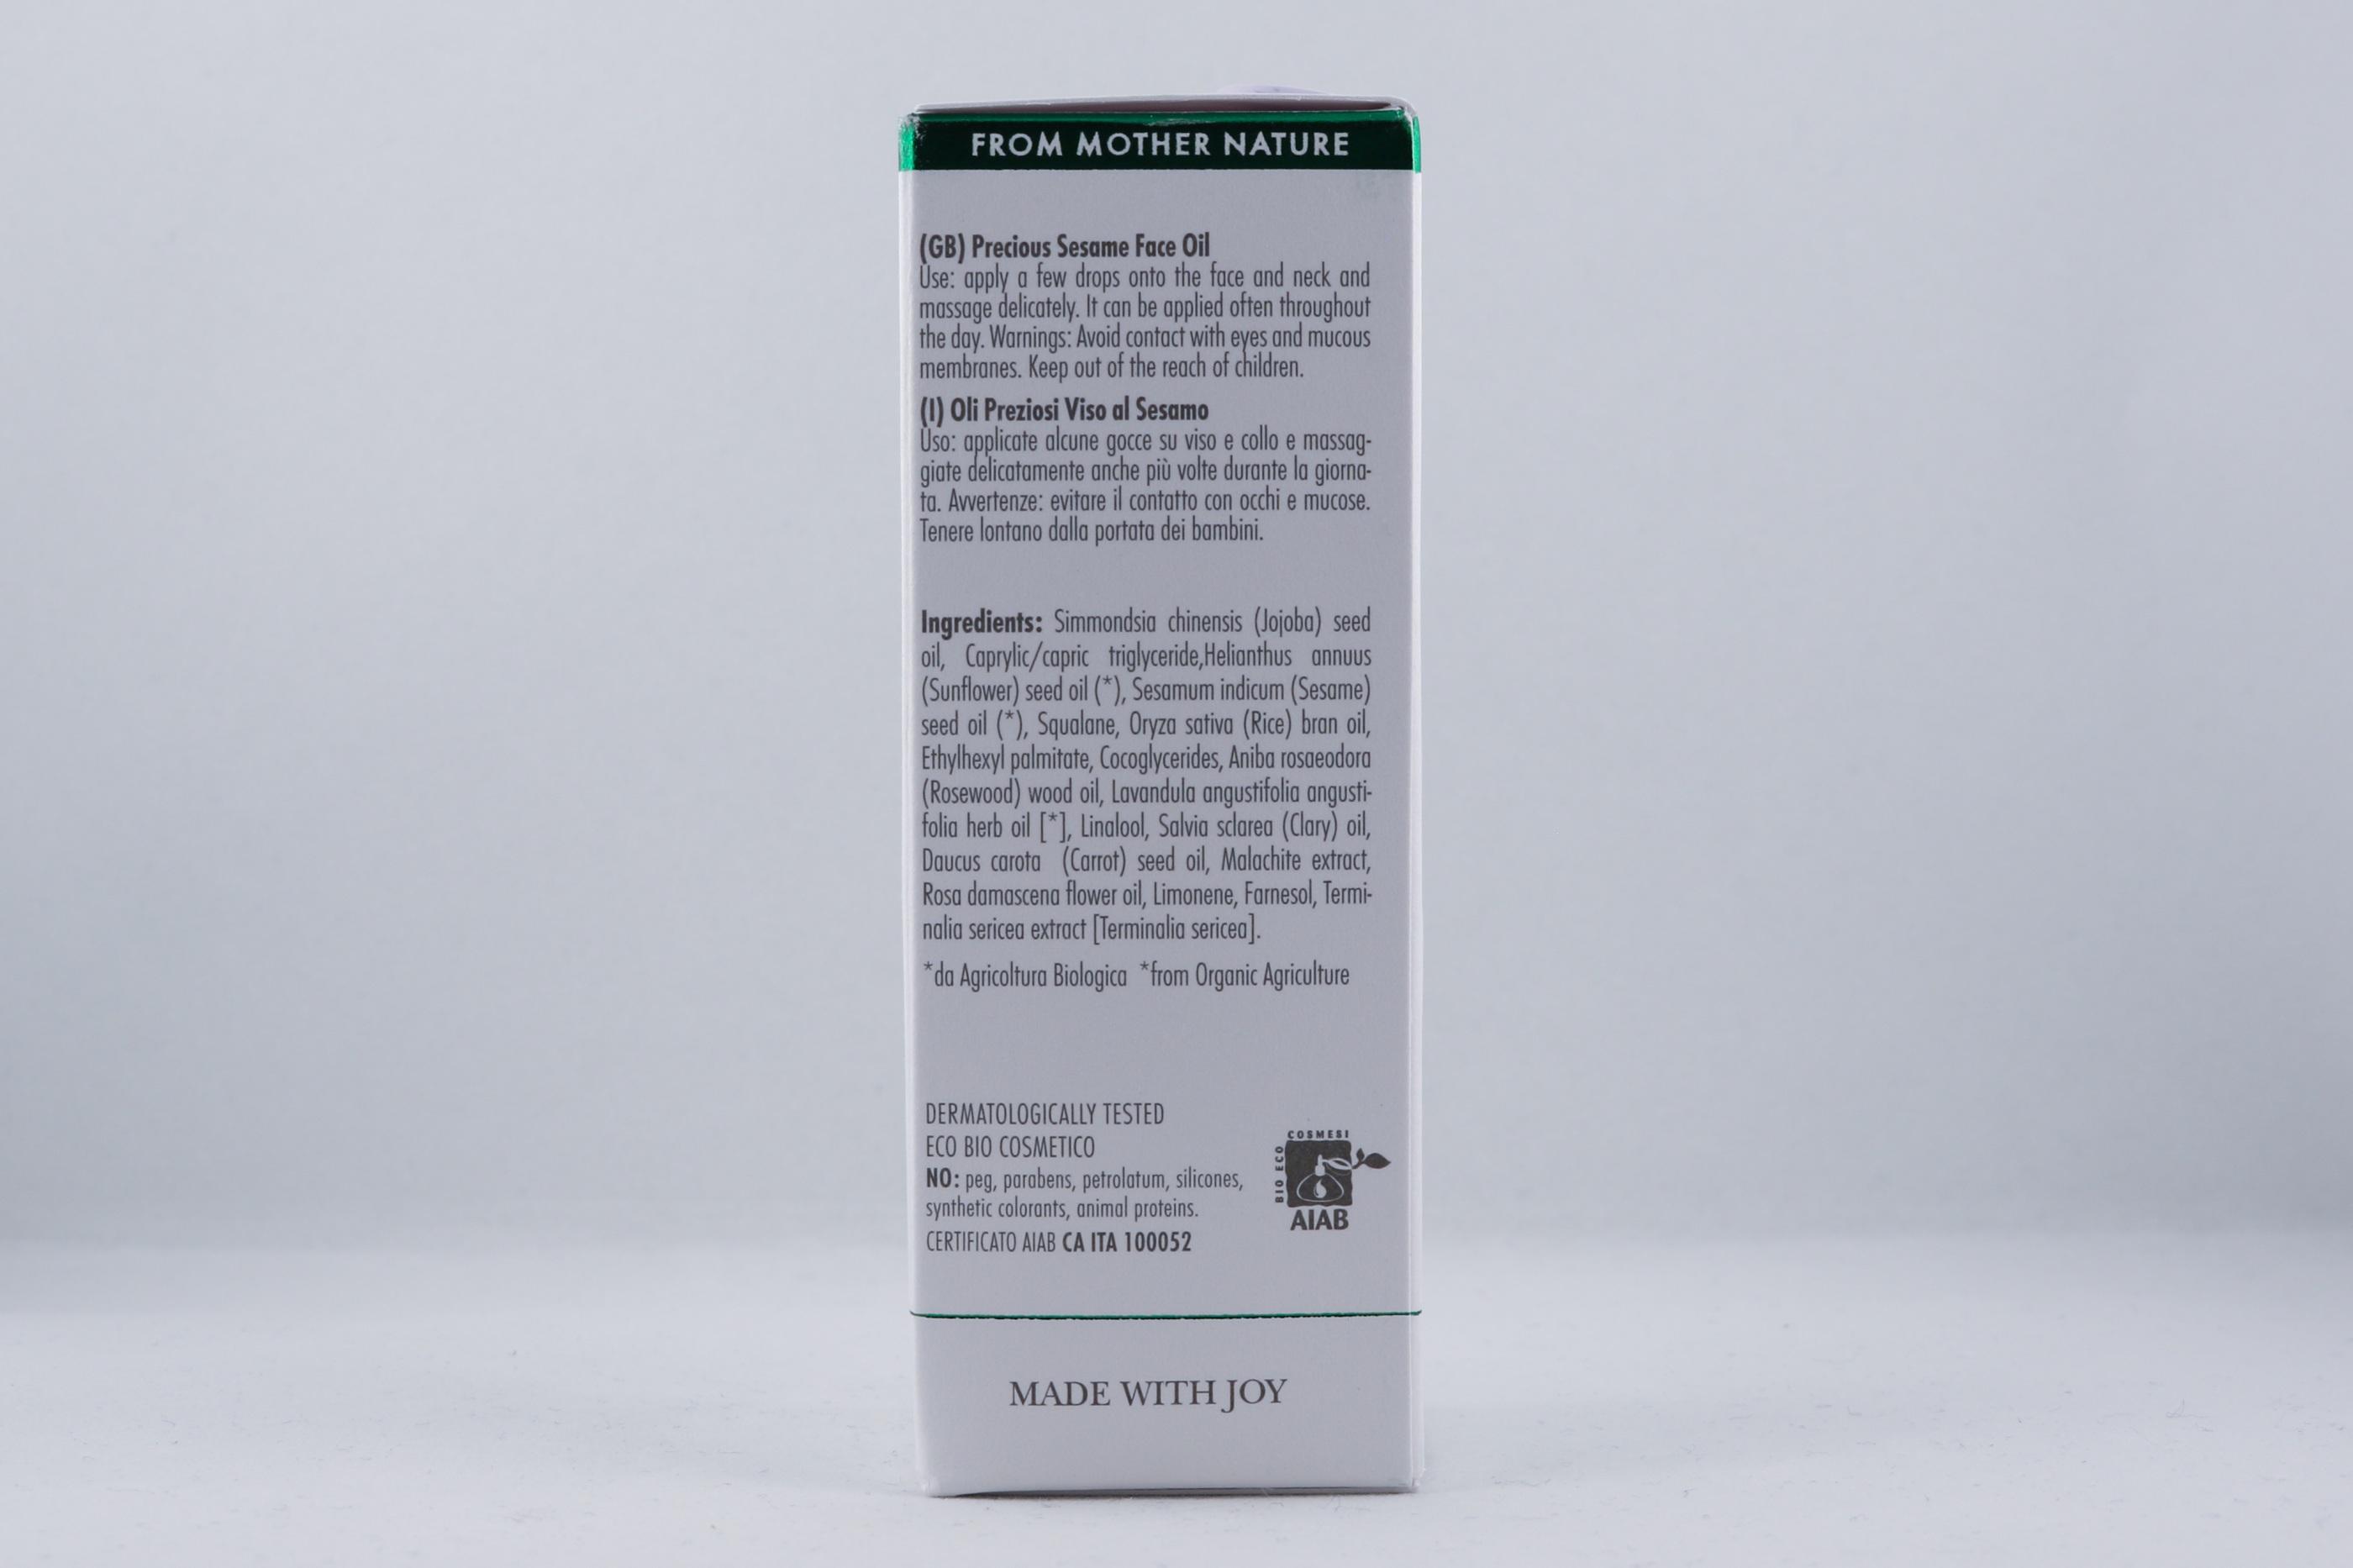 Vata Precious Sesame Face Oil hudvårdsprodukt hudvårdstyp alternativ hälsa wellness ayurveda hudvårdsprodukter